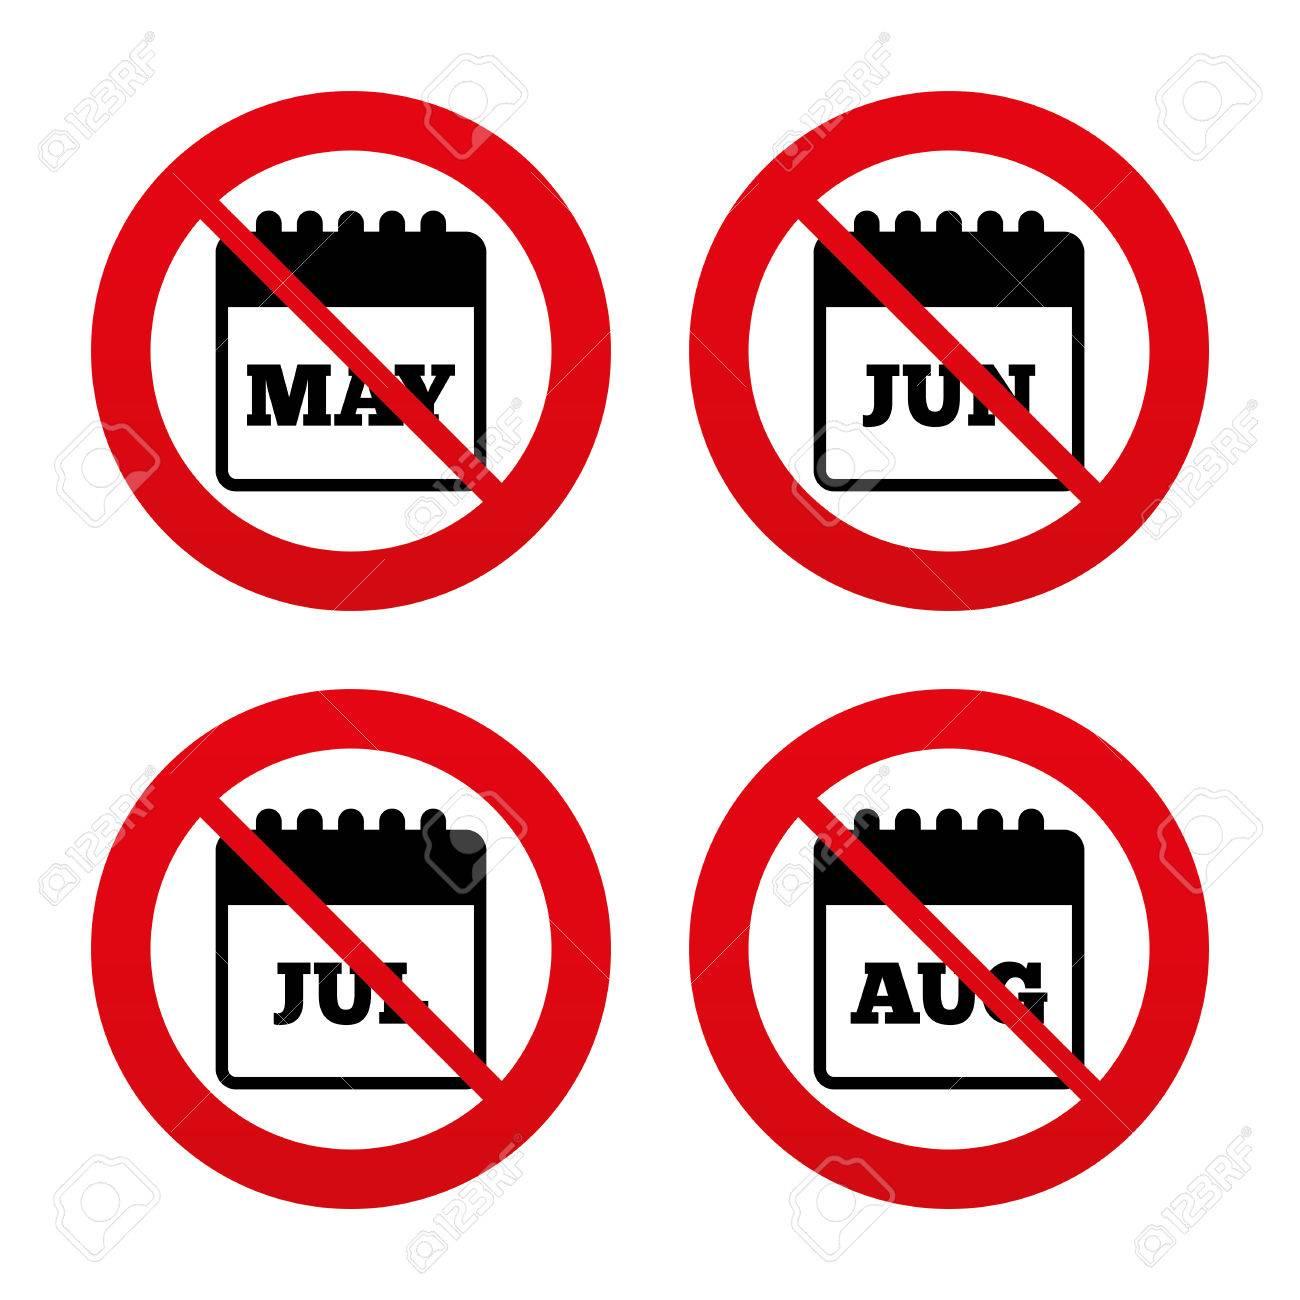 No ban or stop signs calendar icons may june july and august no ban or stop signs calendar icons may june july and buycottarizona Image collections